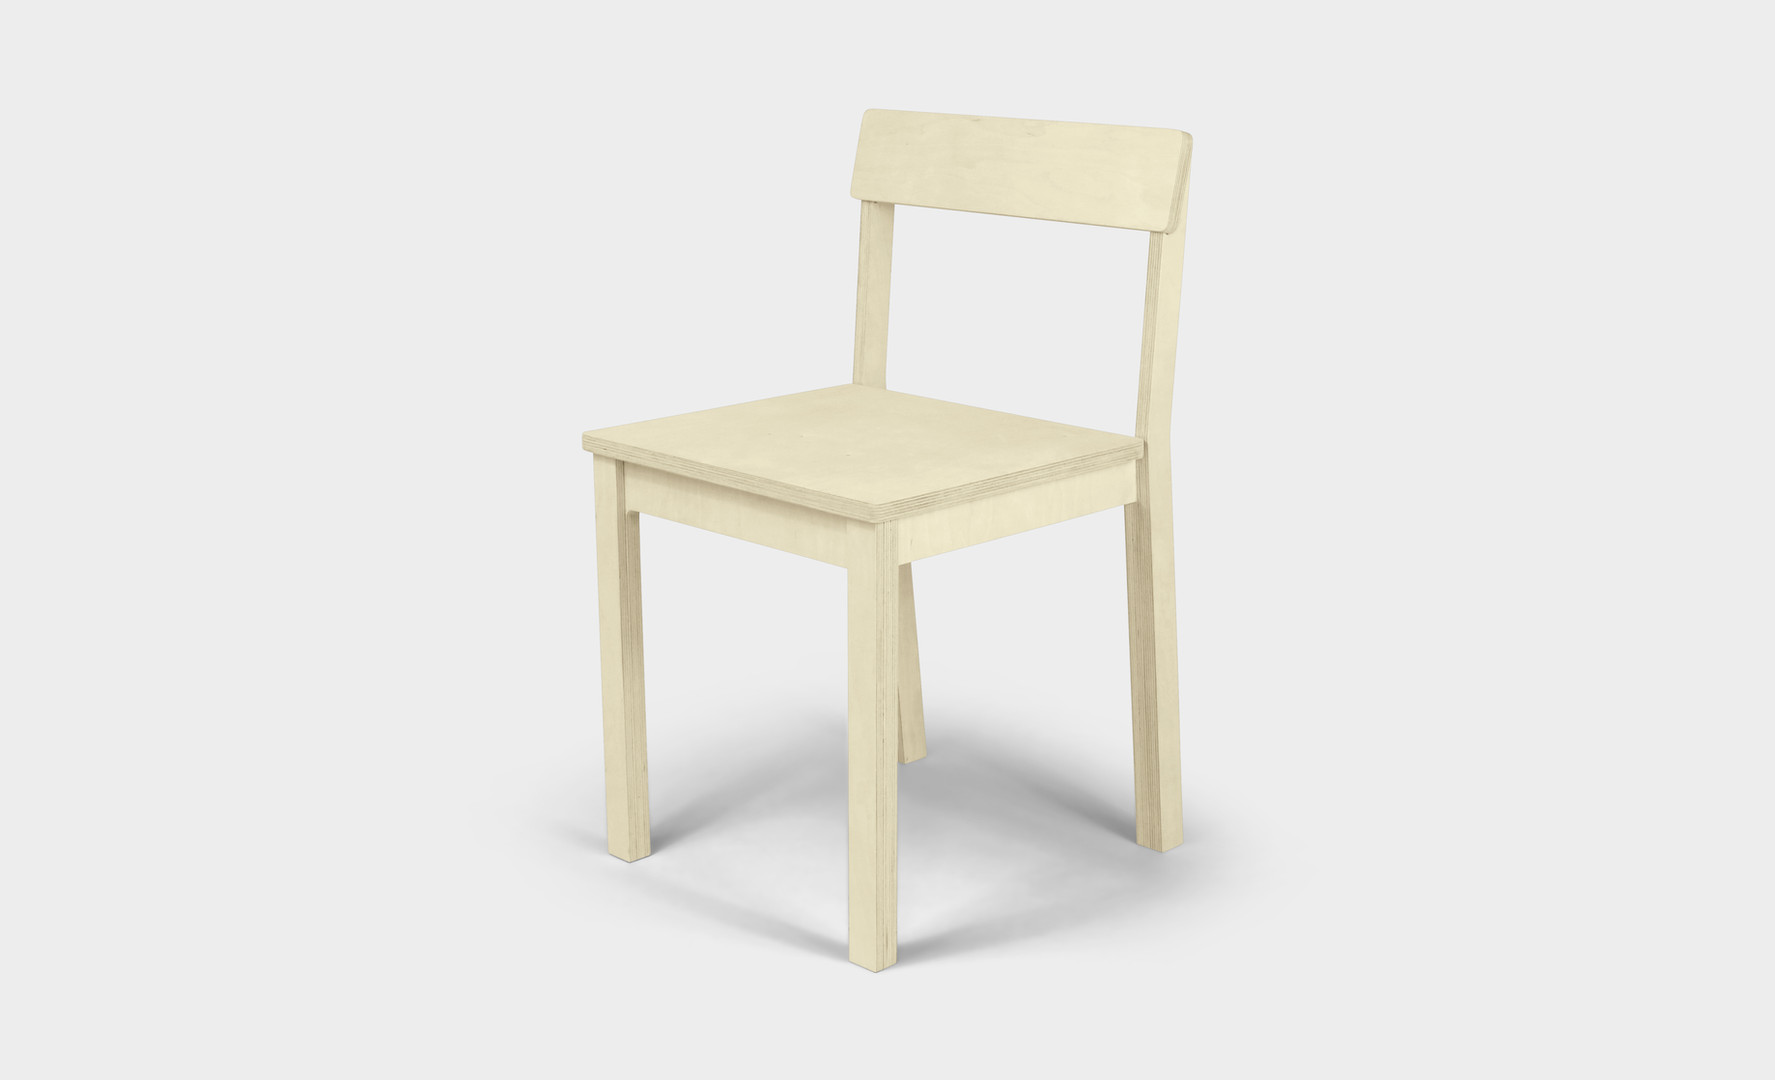 LAGOM_Chair_Diagonal.jpg